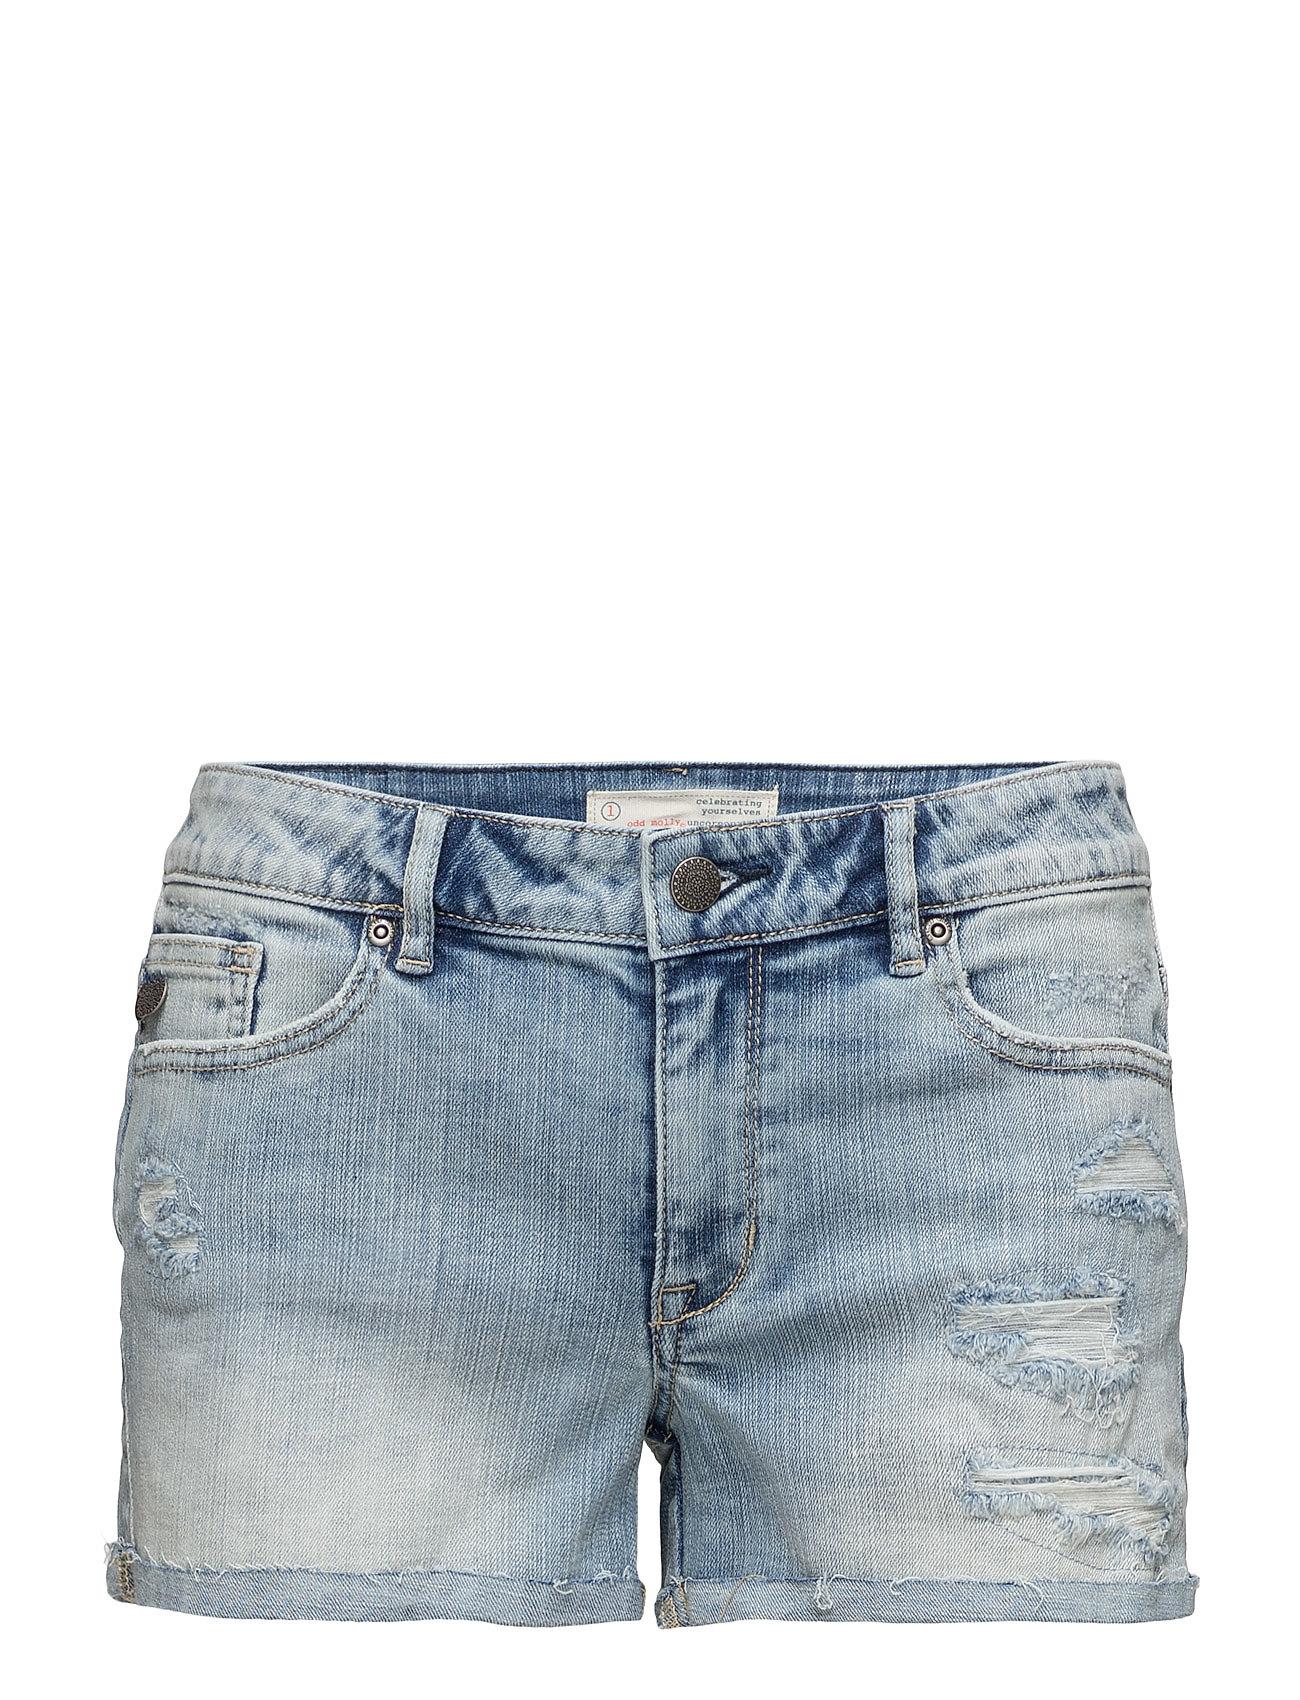 Loose It Jeans Shorts ODD MOLLY Denim til Damer i